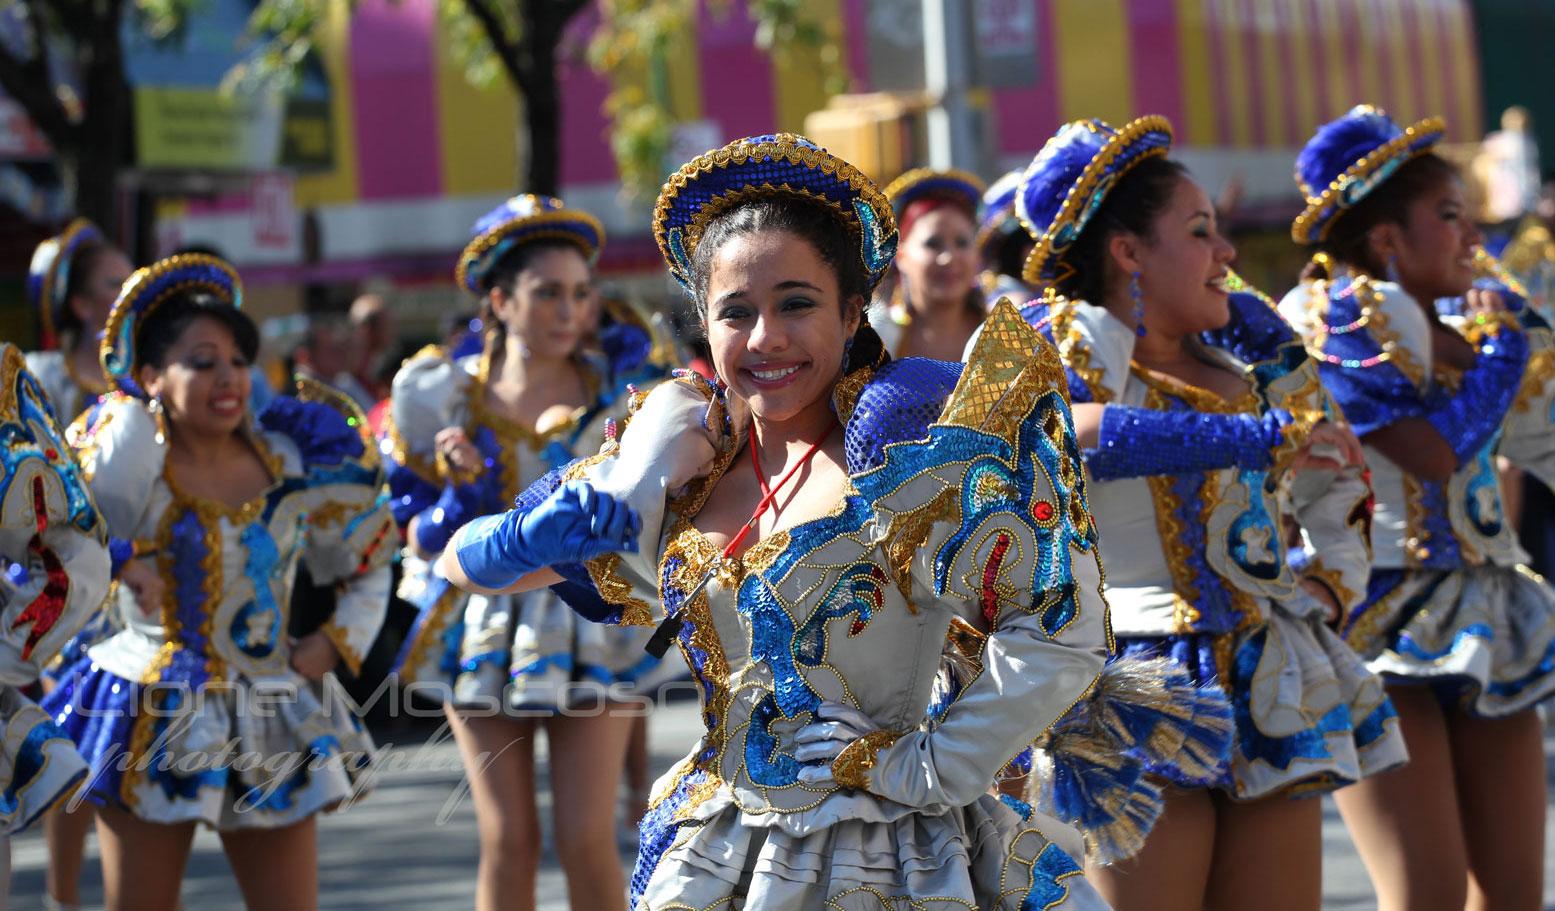 danzas bolivianas chicas Caporales San Simon bloque New York USA